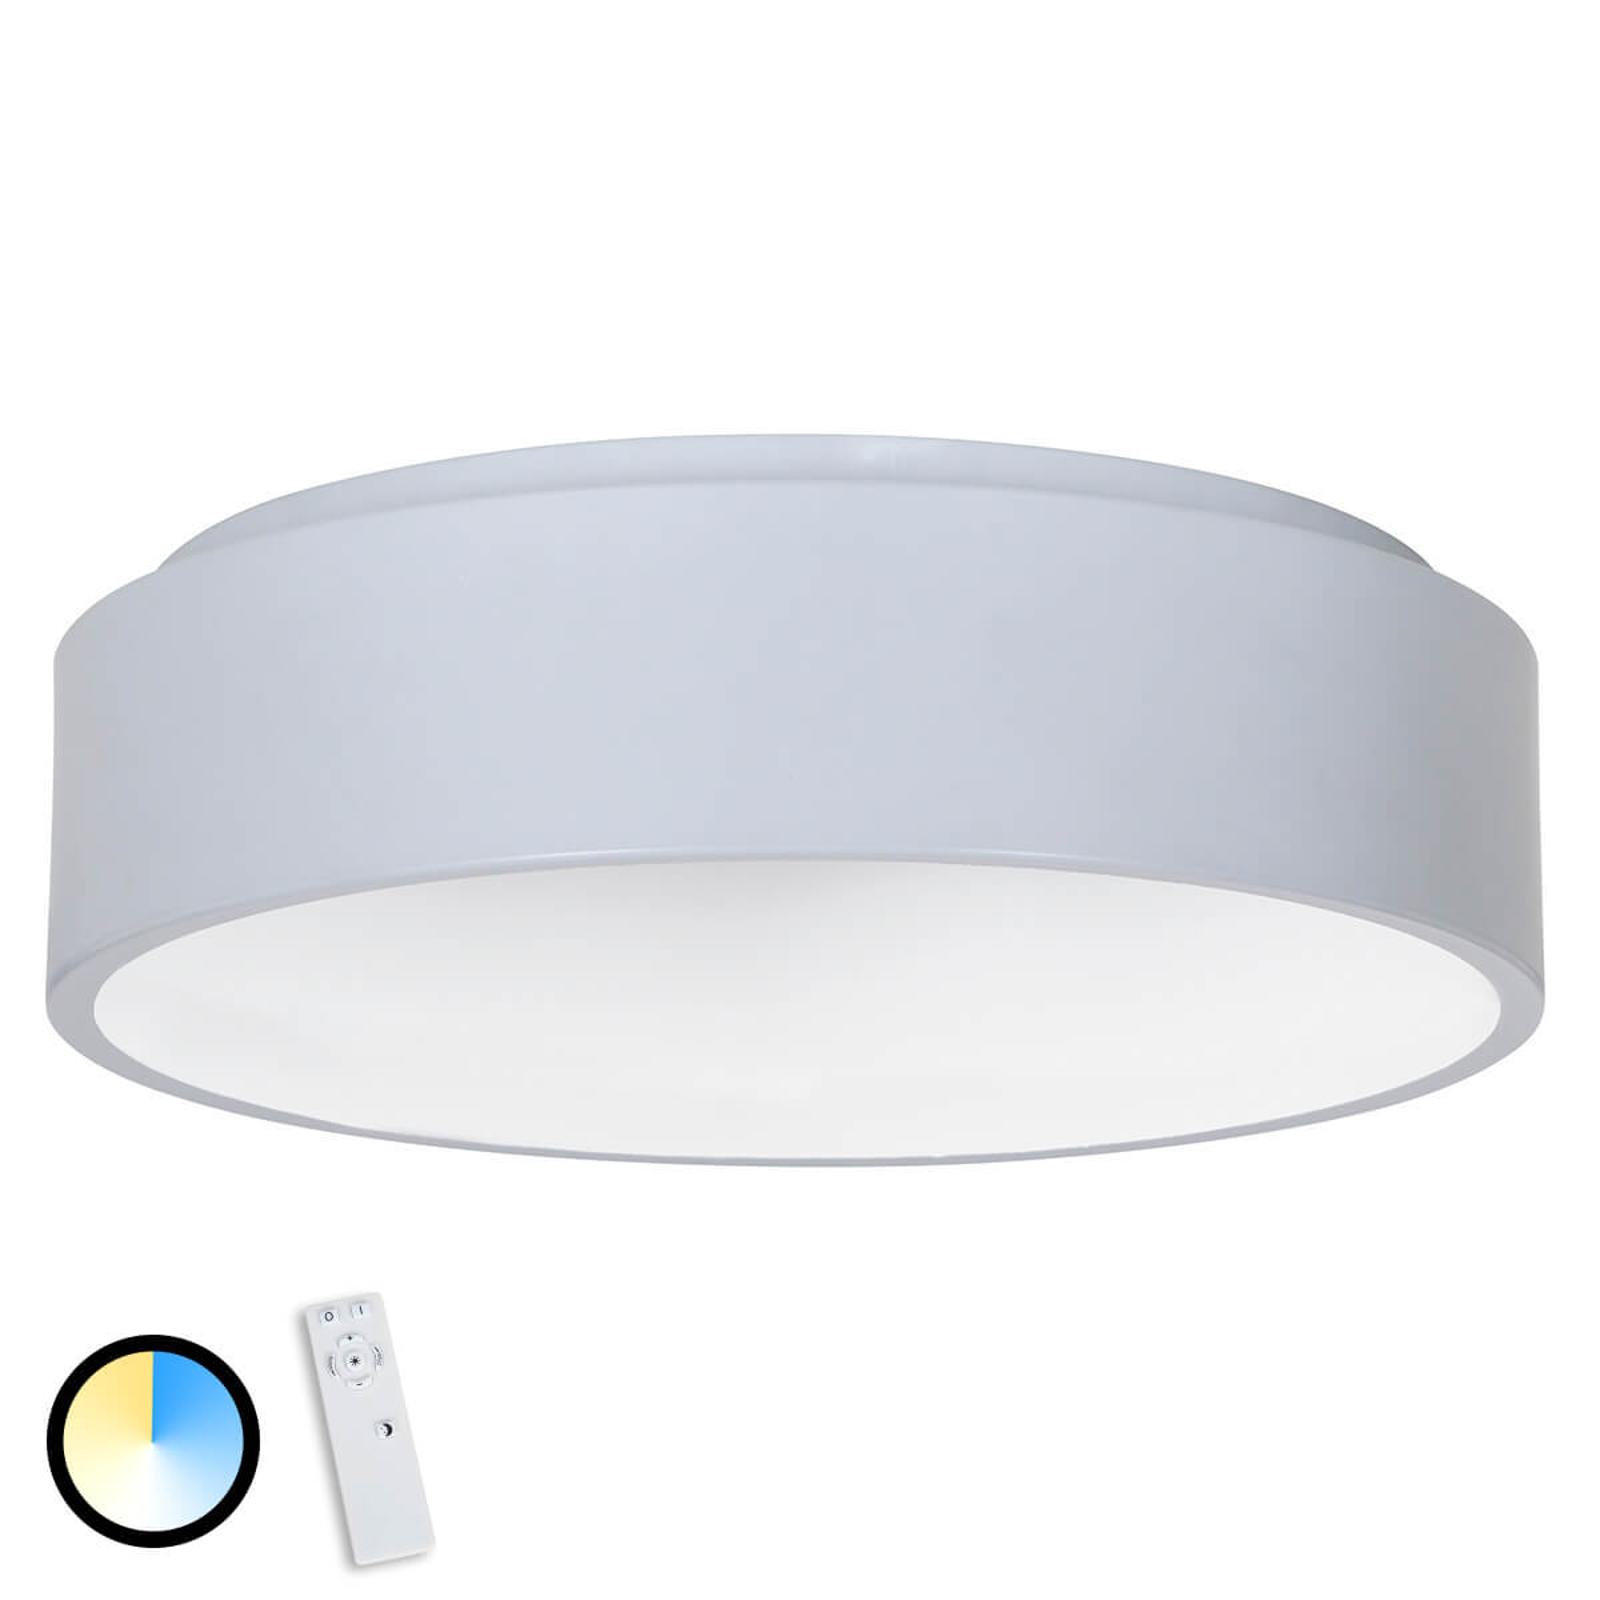 Szara lampa sufitowa LED Birte z pilotem